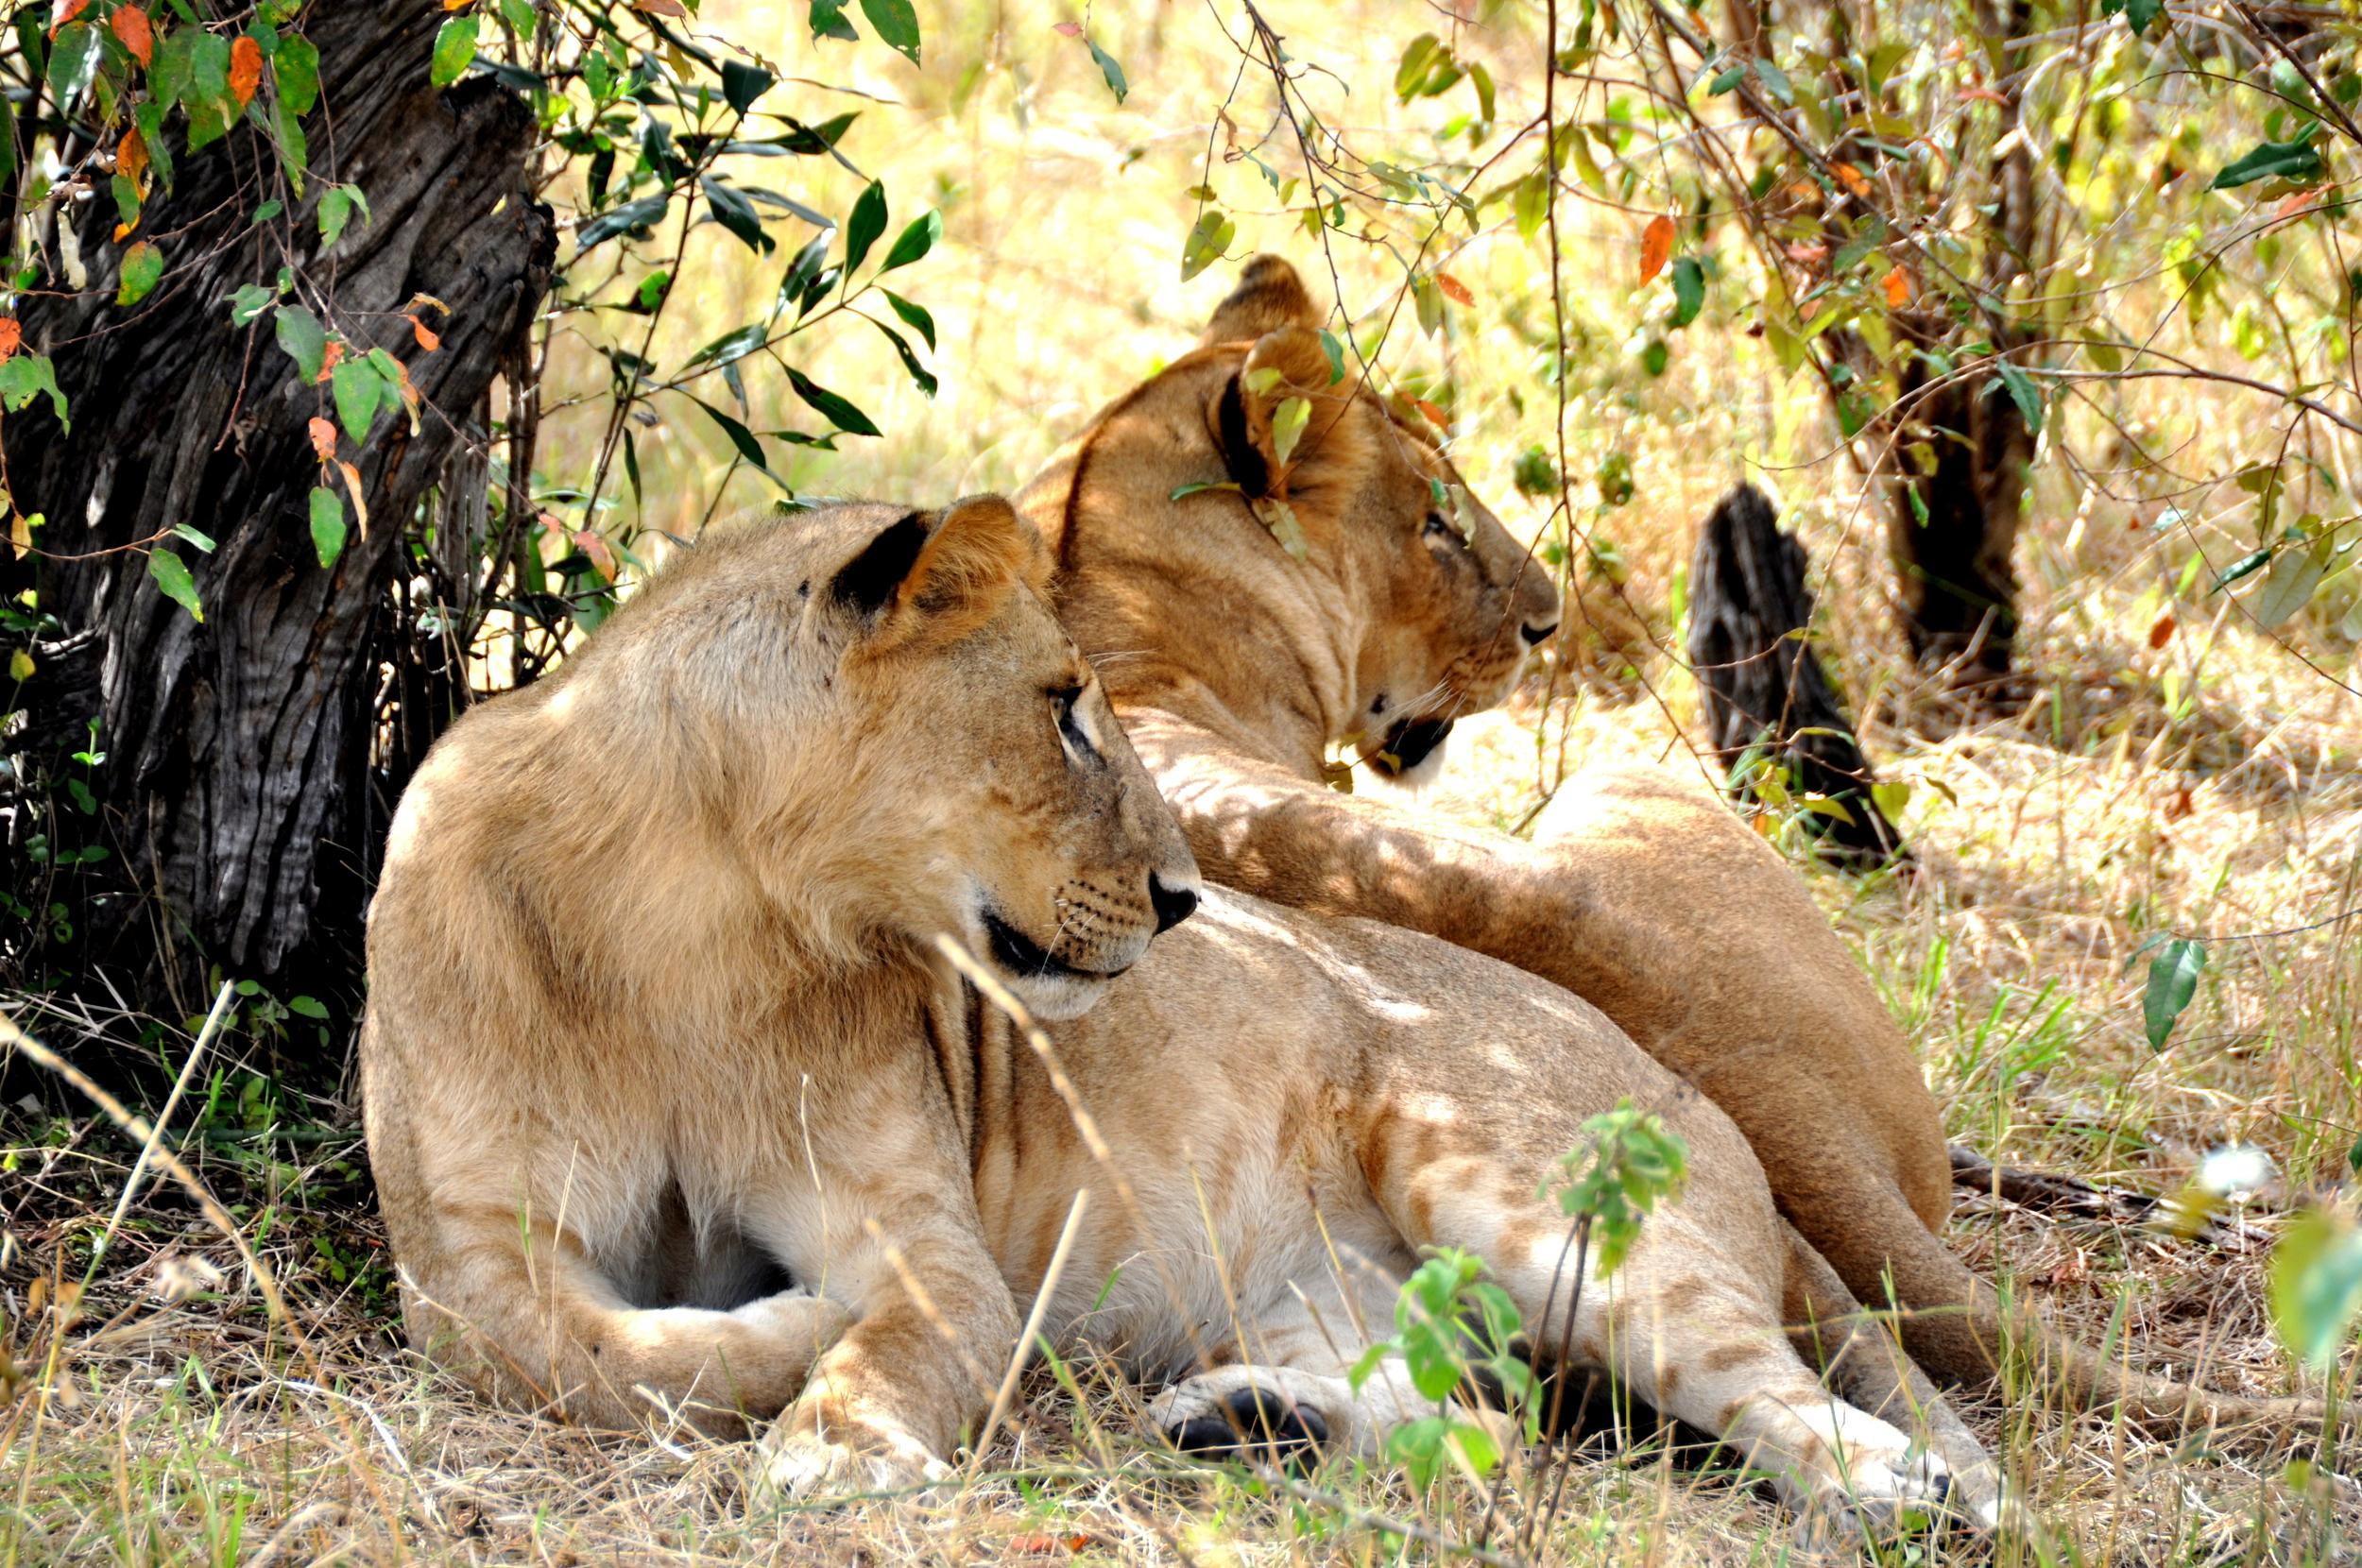 Lions Twins Mirror Image Kenya Maasai Mara Africa